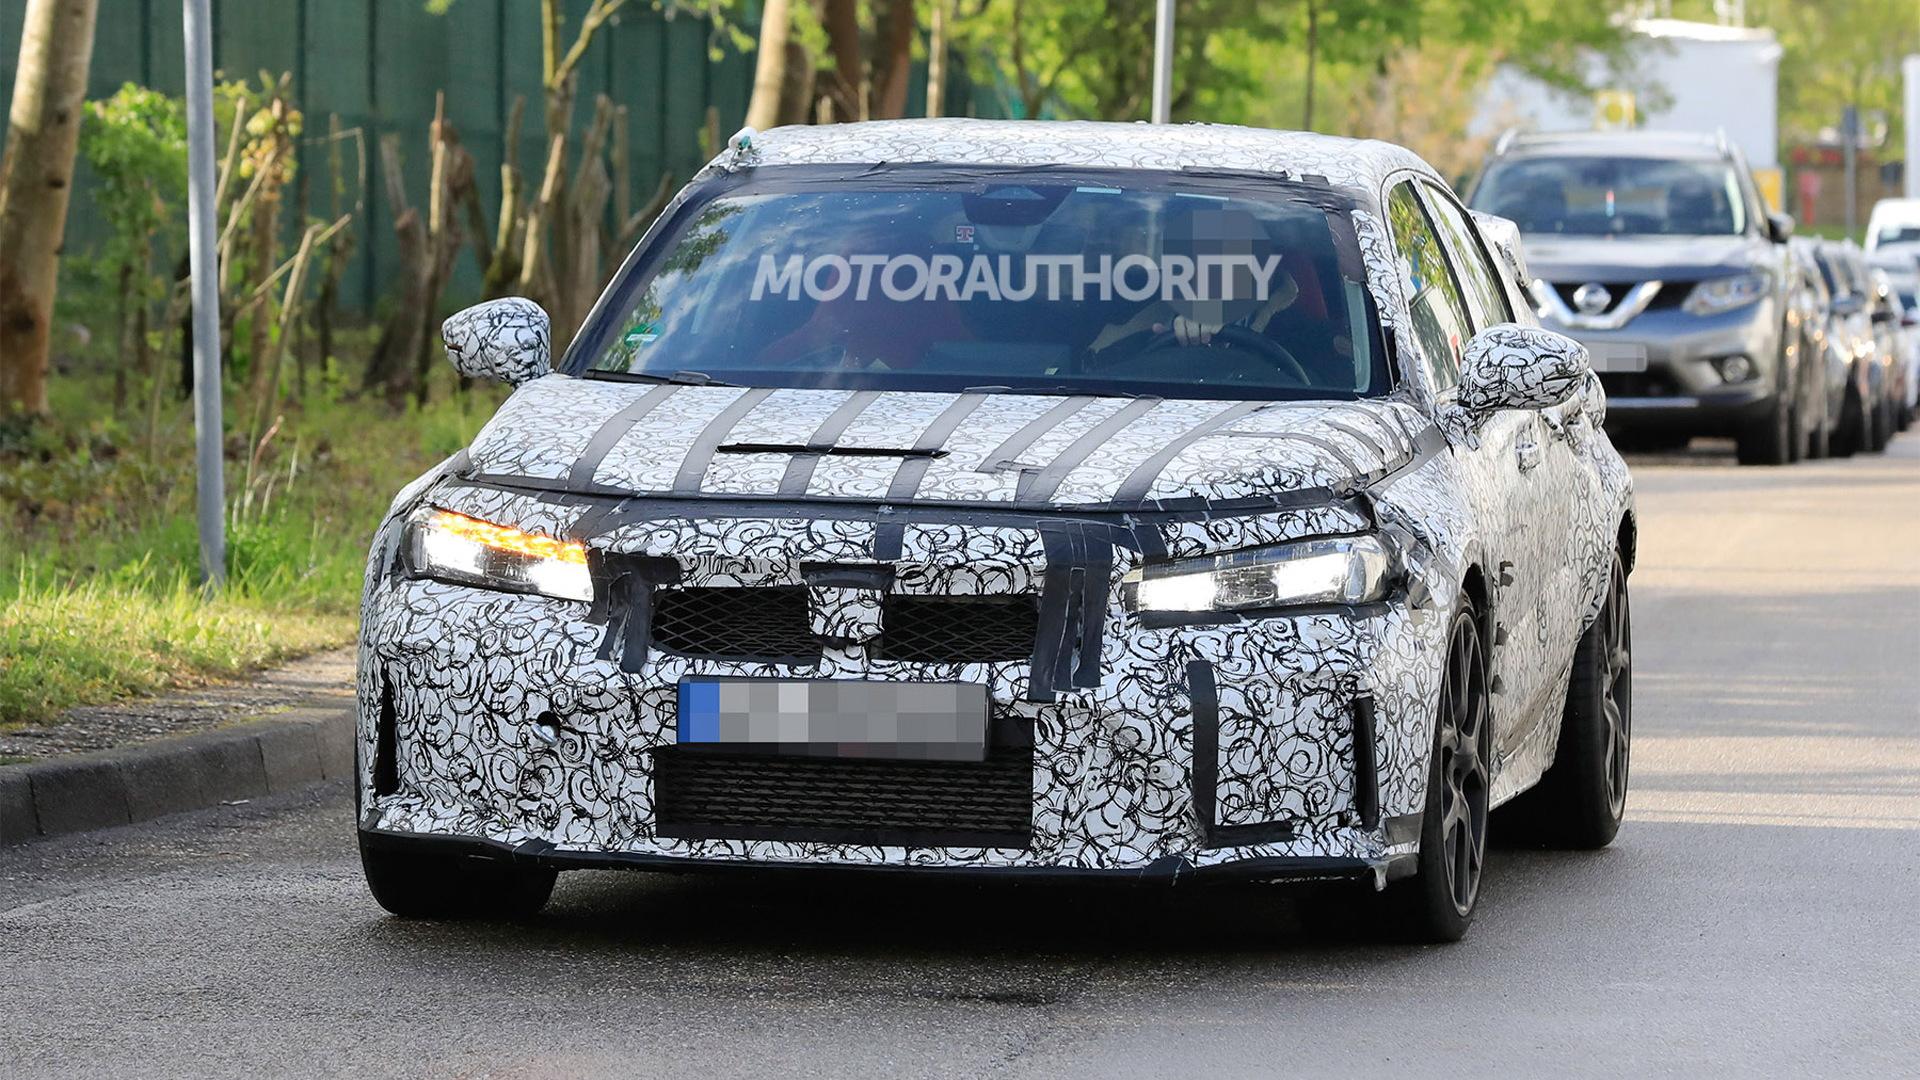 2022 Honda Civic Type R spy shots - Photo credit:S. Baldauf/SB-Medien